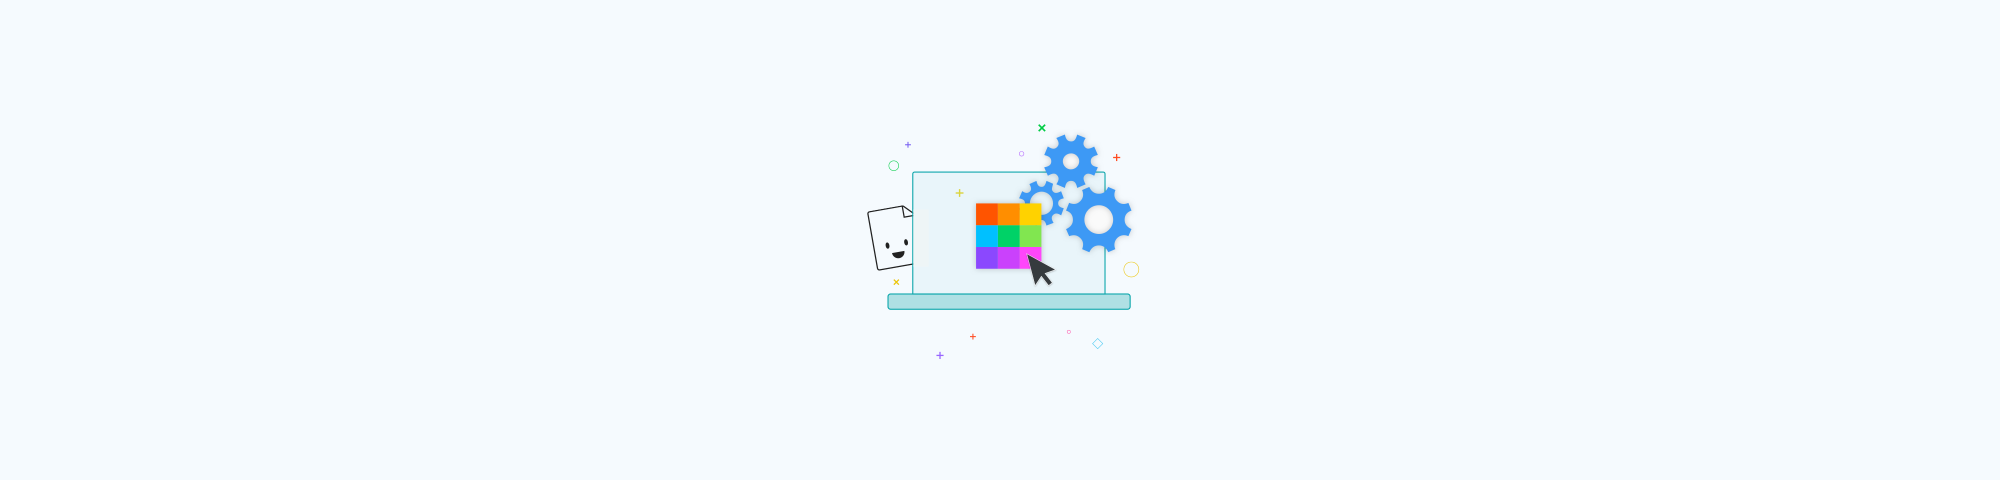 smallpdf for desktop